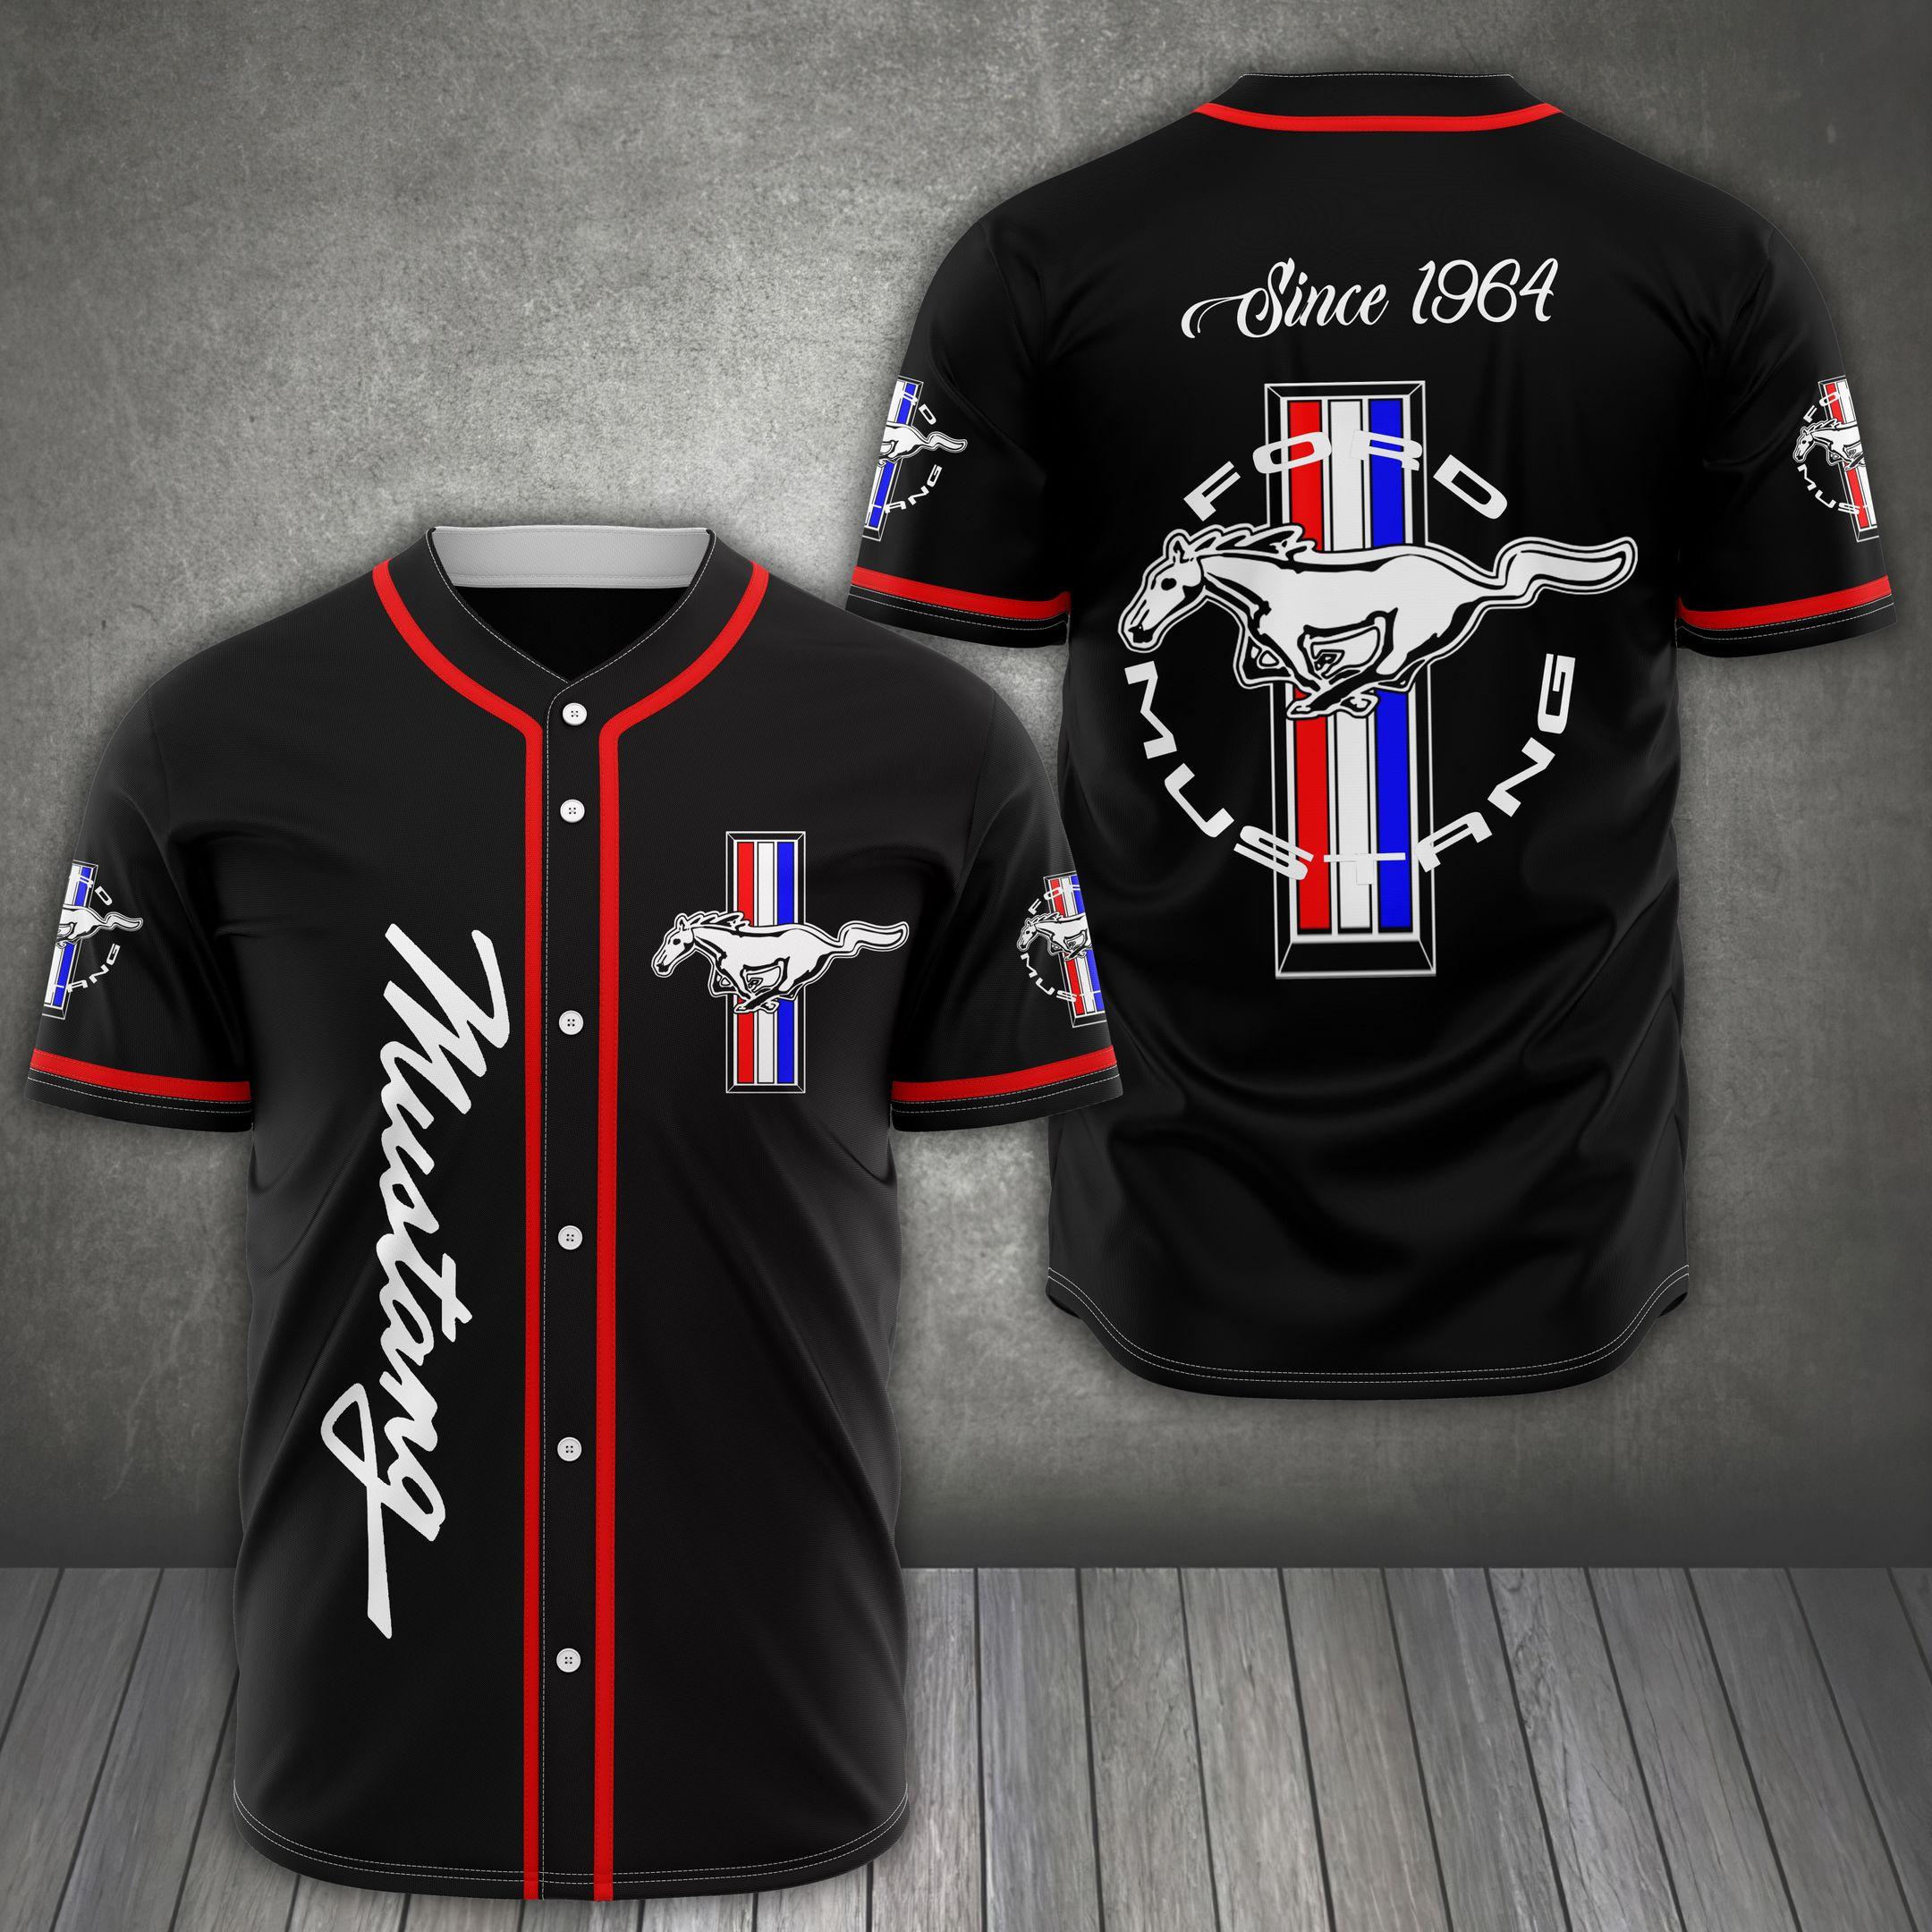 Ford Mustang Since 1964 classic baseball Jersey shirt